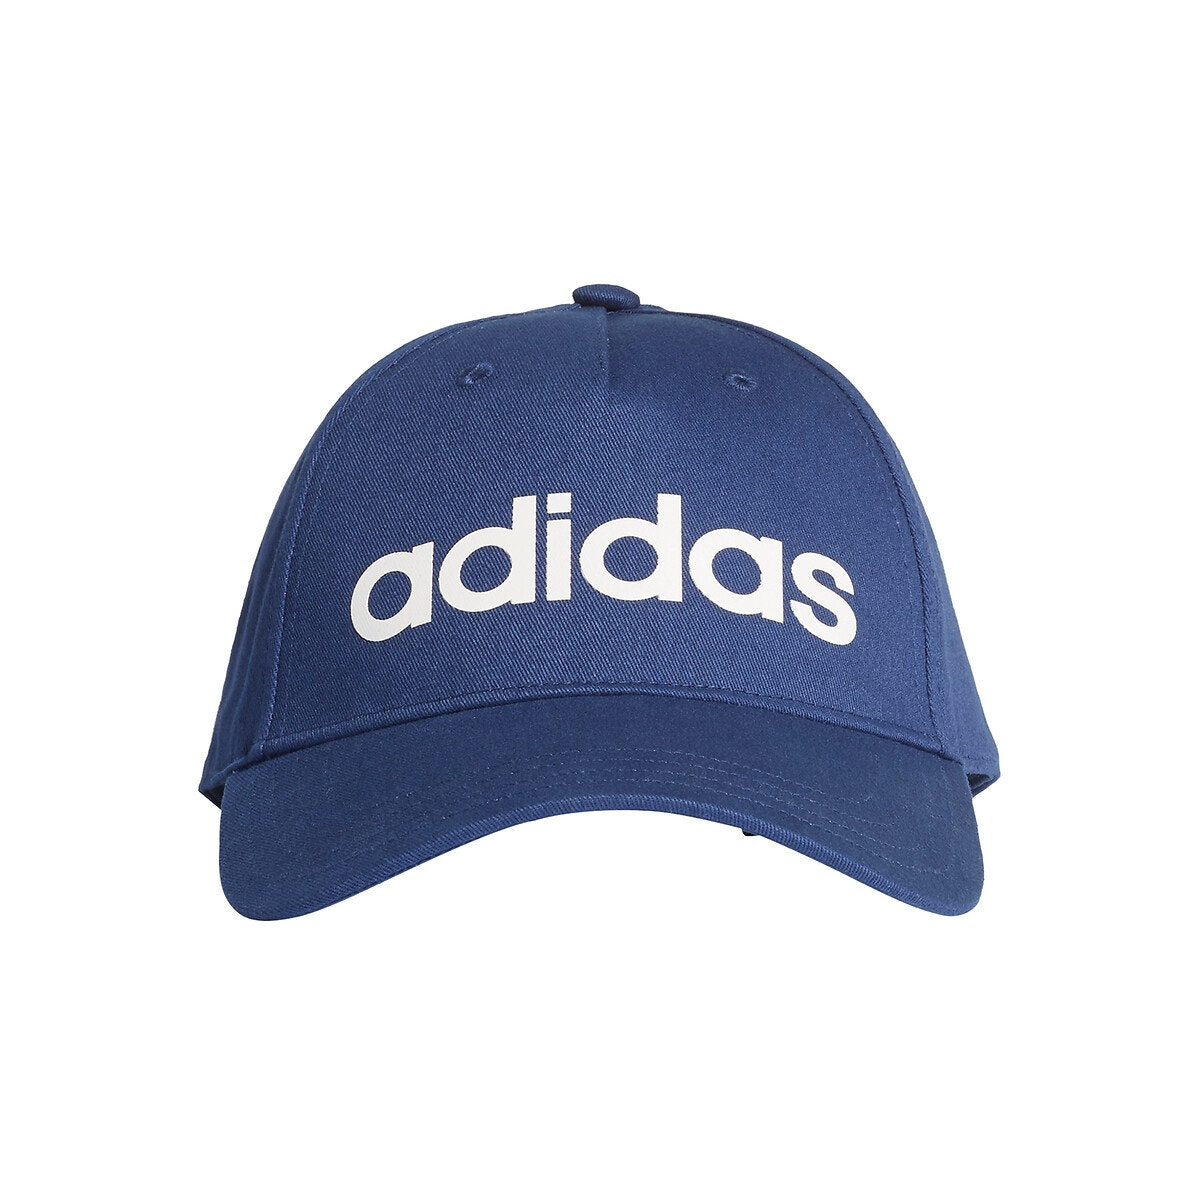 adidas Performance - Καπέλο, Daily 350173620 - 1629